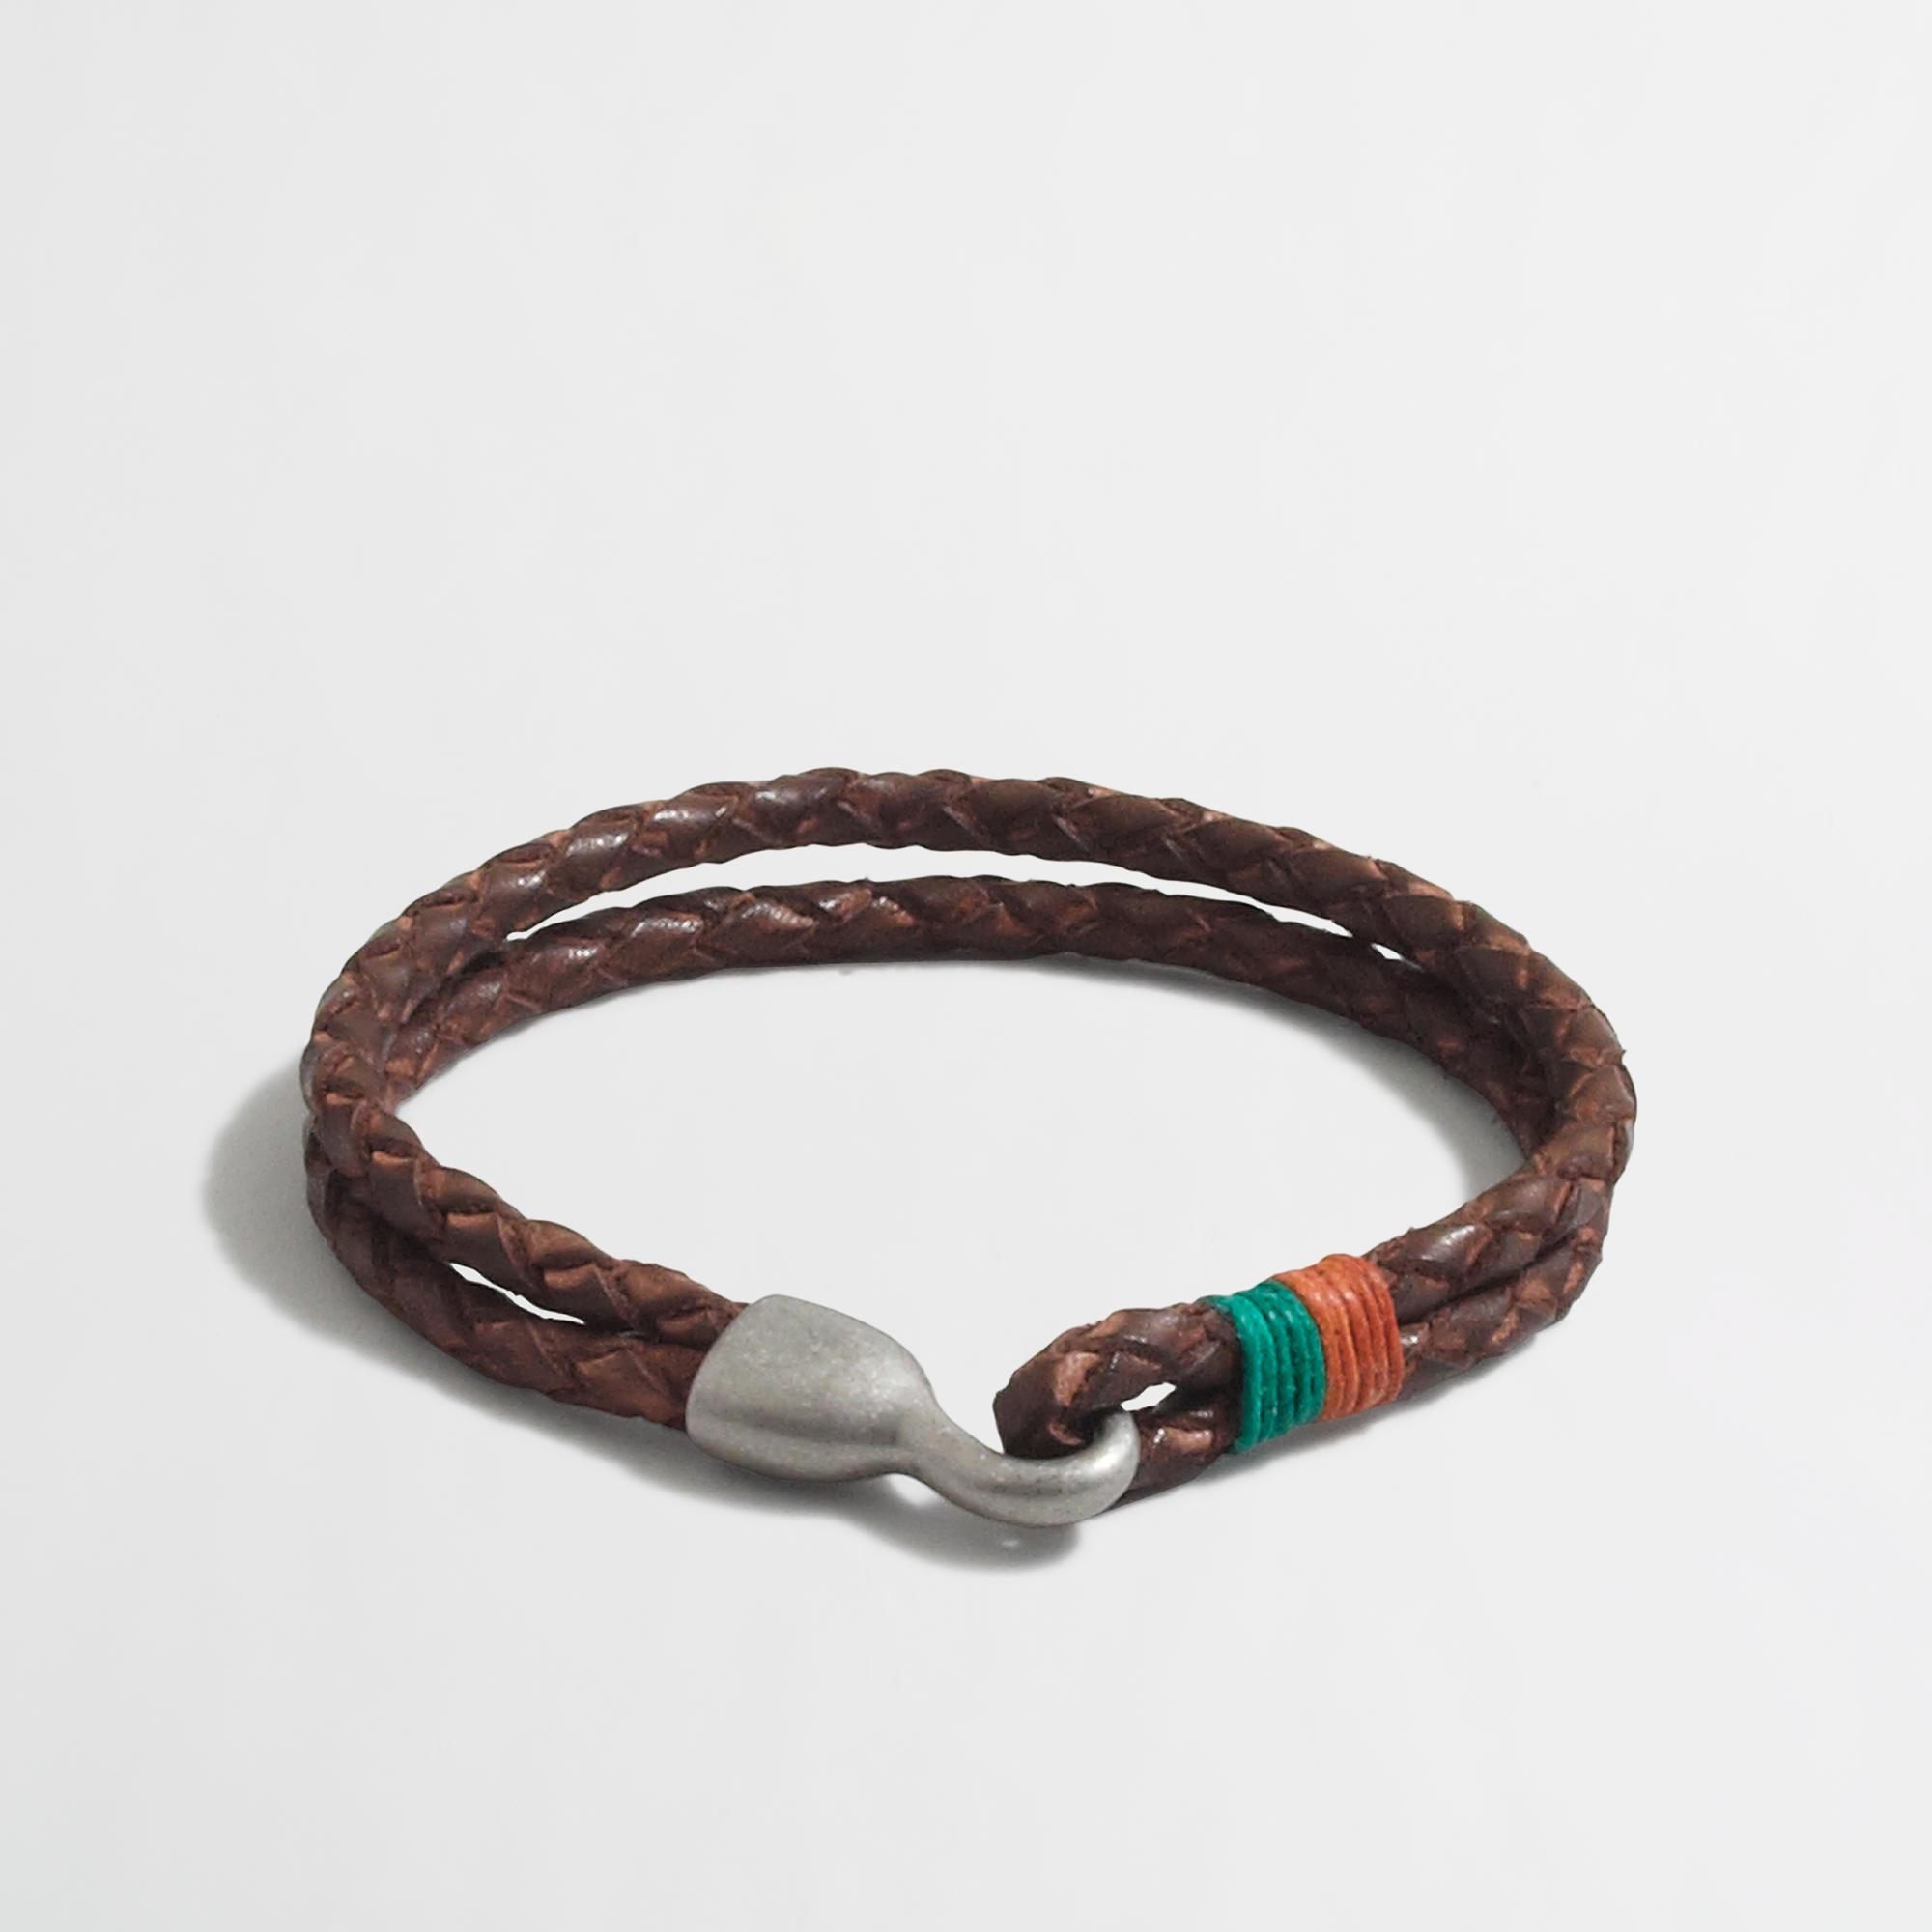 Factory Leather Braided Bracelet